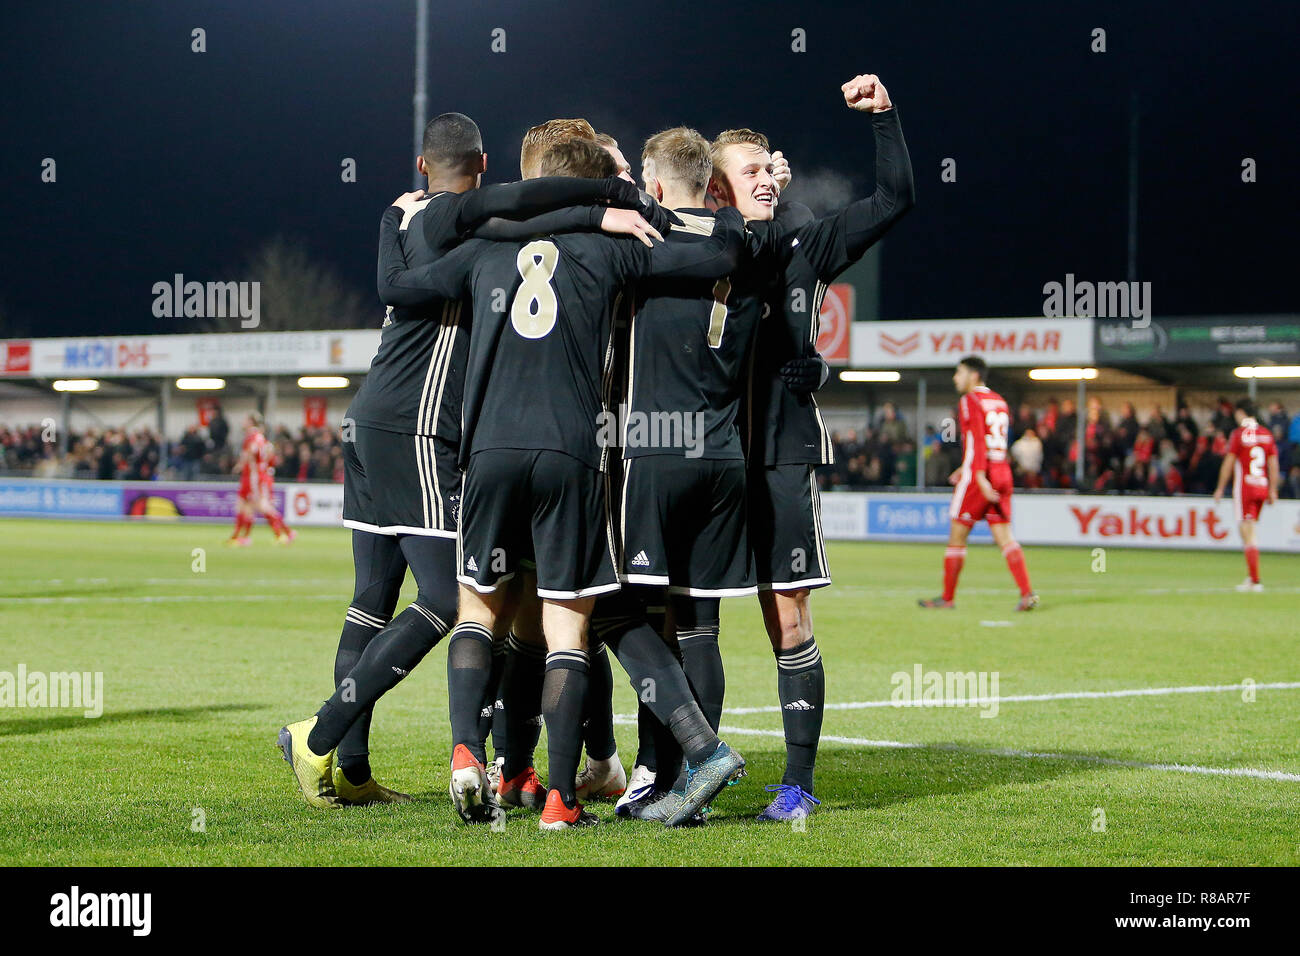 Keuken Kampioen Almere : Almere yanmar stadion saison